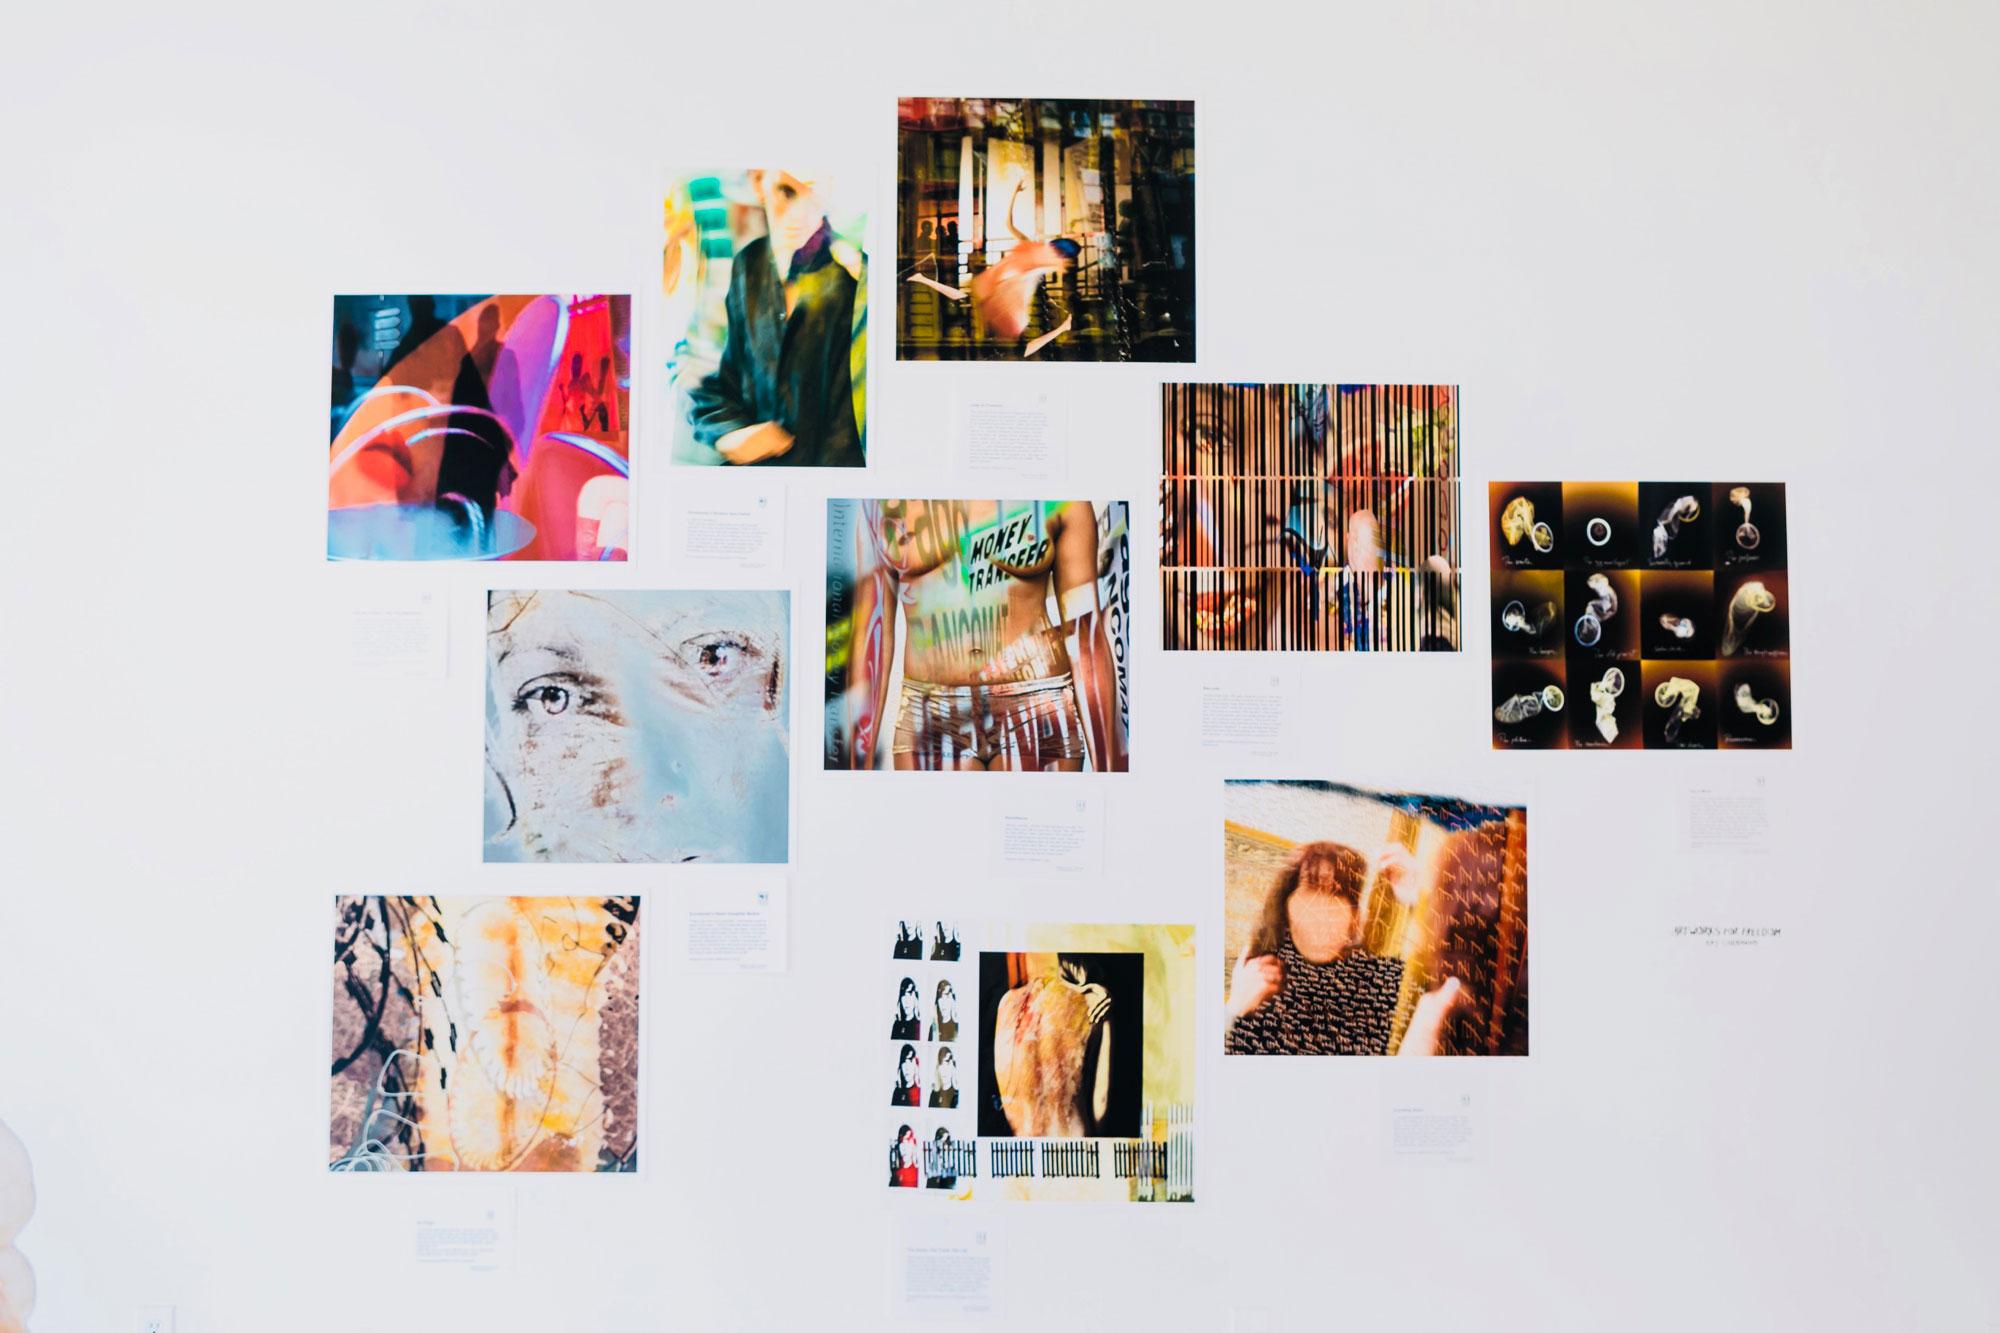 Art Works for Freedom | Kay Chernush | Protecting Innocence | Luz Art Los Angeles, CA